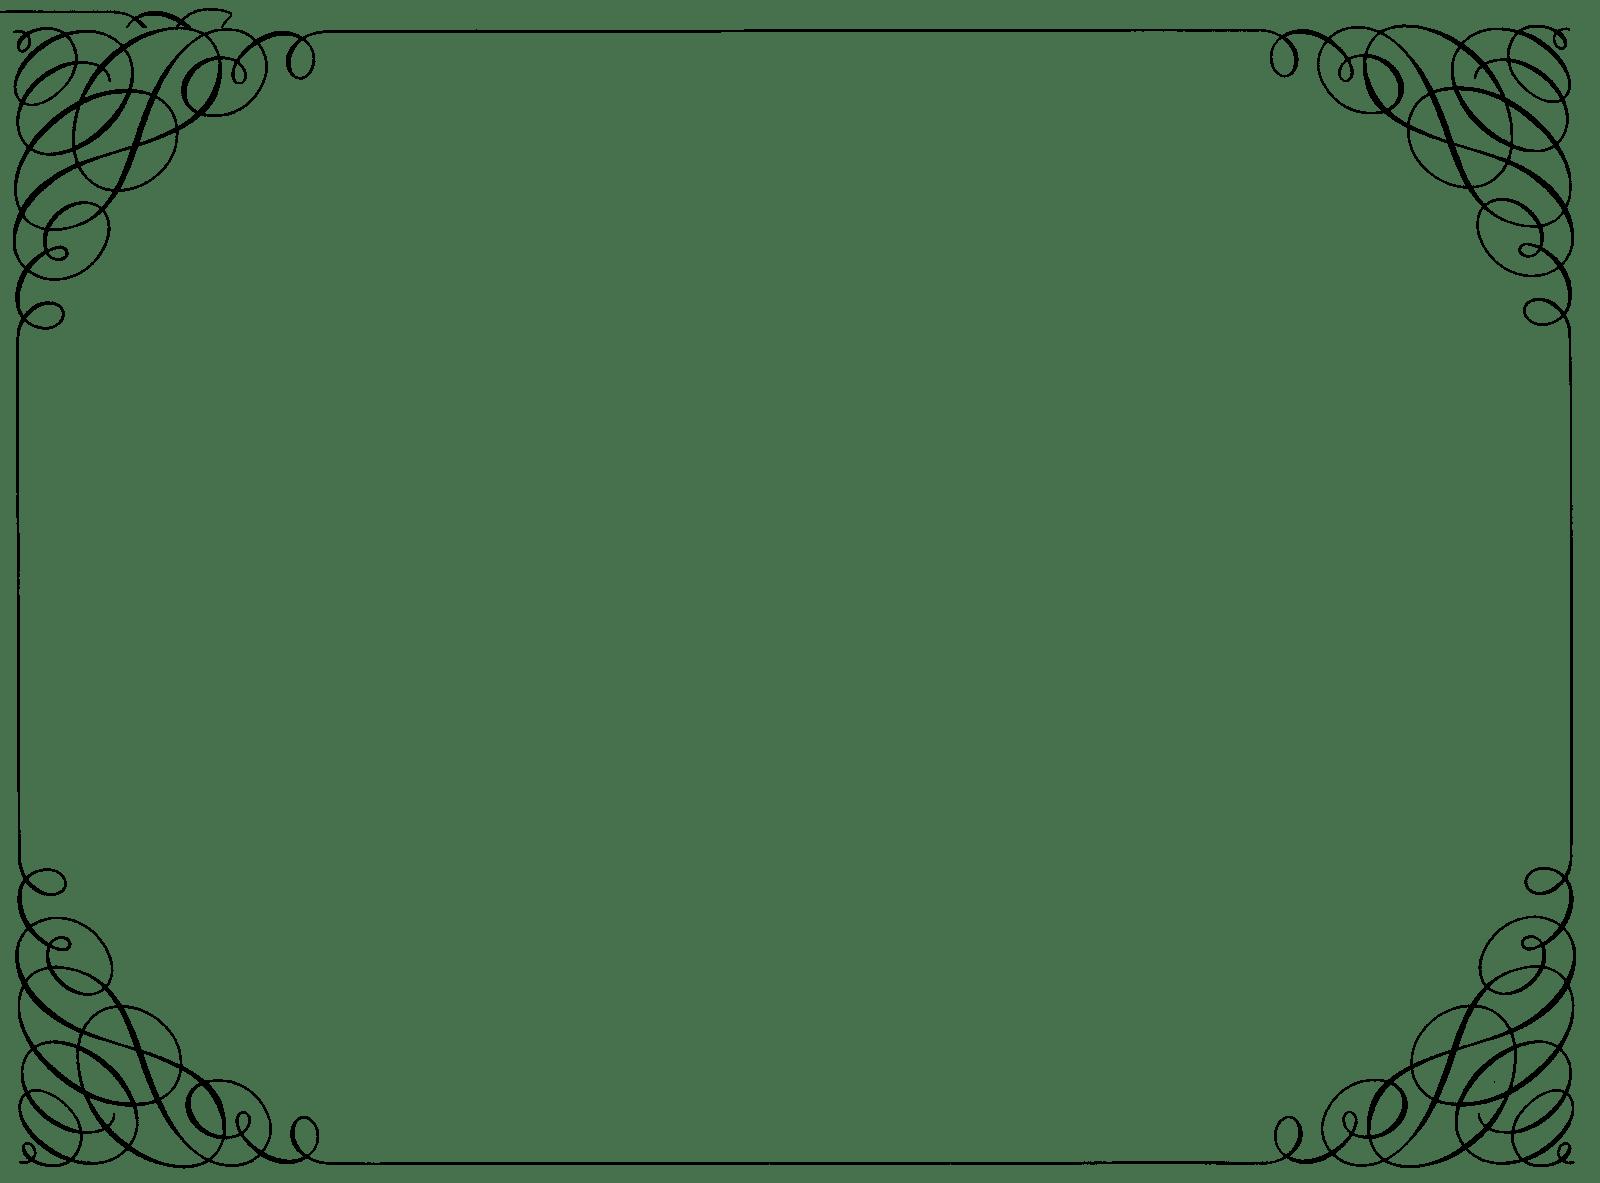 Free Thanksgiving Coloring Pages furthermore Flags in addition Cool Border Designs as well Simbolo De Vida Por Que Utilizar Un Simbolo Paraodontologia further Disney Sofia Sugarette Cake Topper Pack Of 12 Sugarette 2 Cake Toppers 4514866. on indian decorations